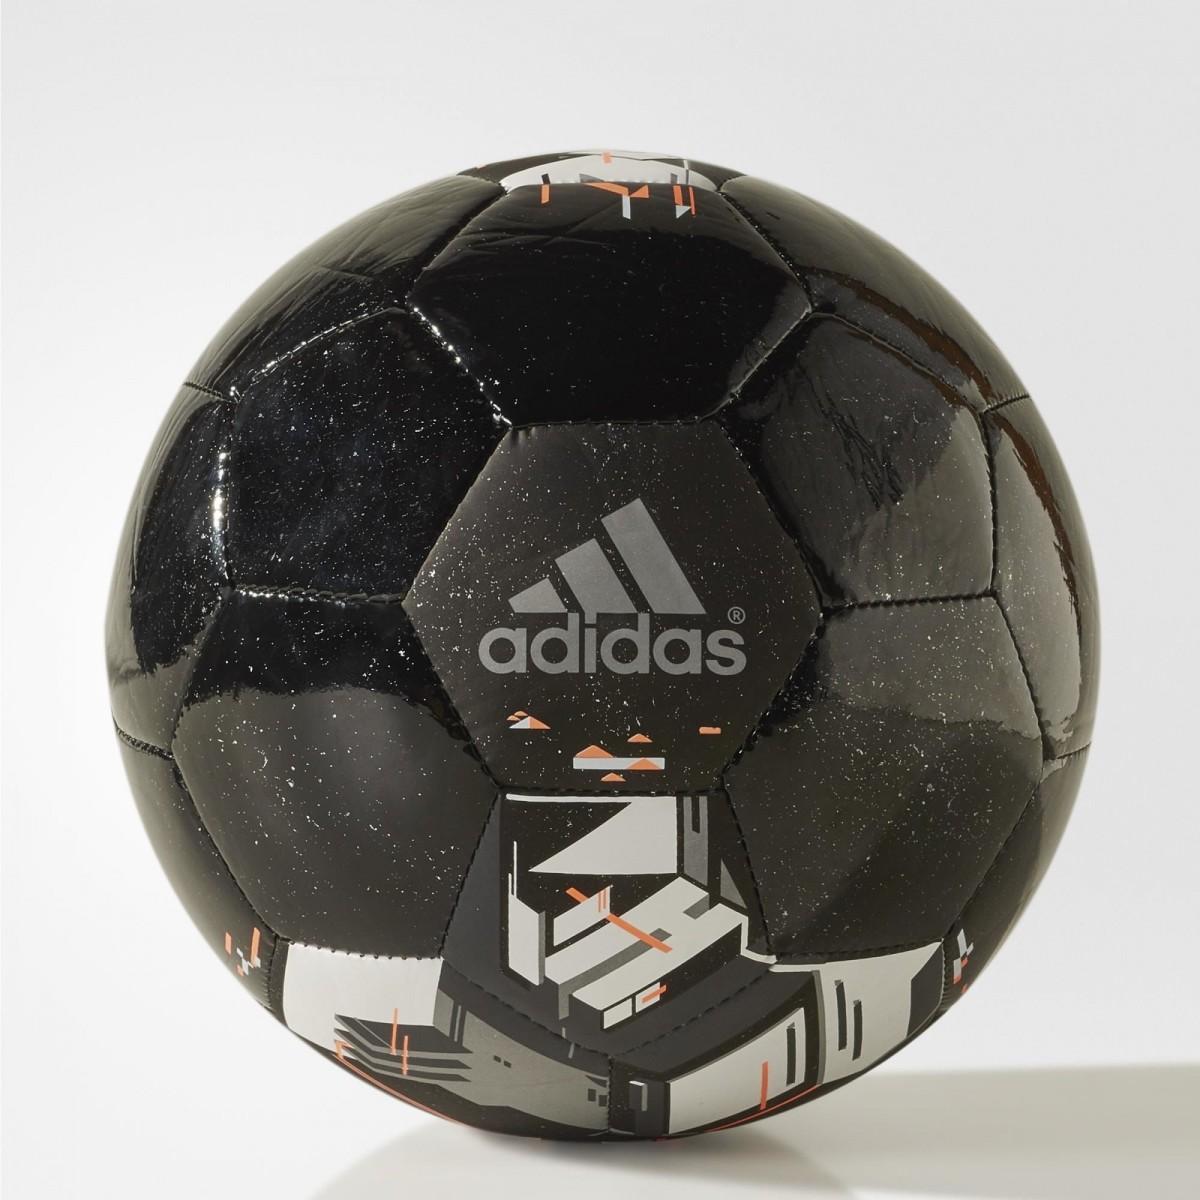 98979a43be4b7 Bizz Store - Bola de Futsal Adidas Off Pitch Sala S90261